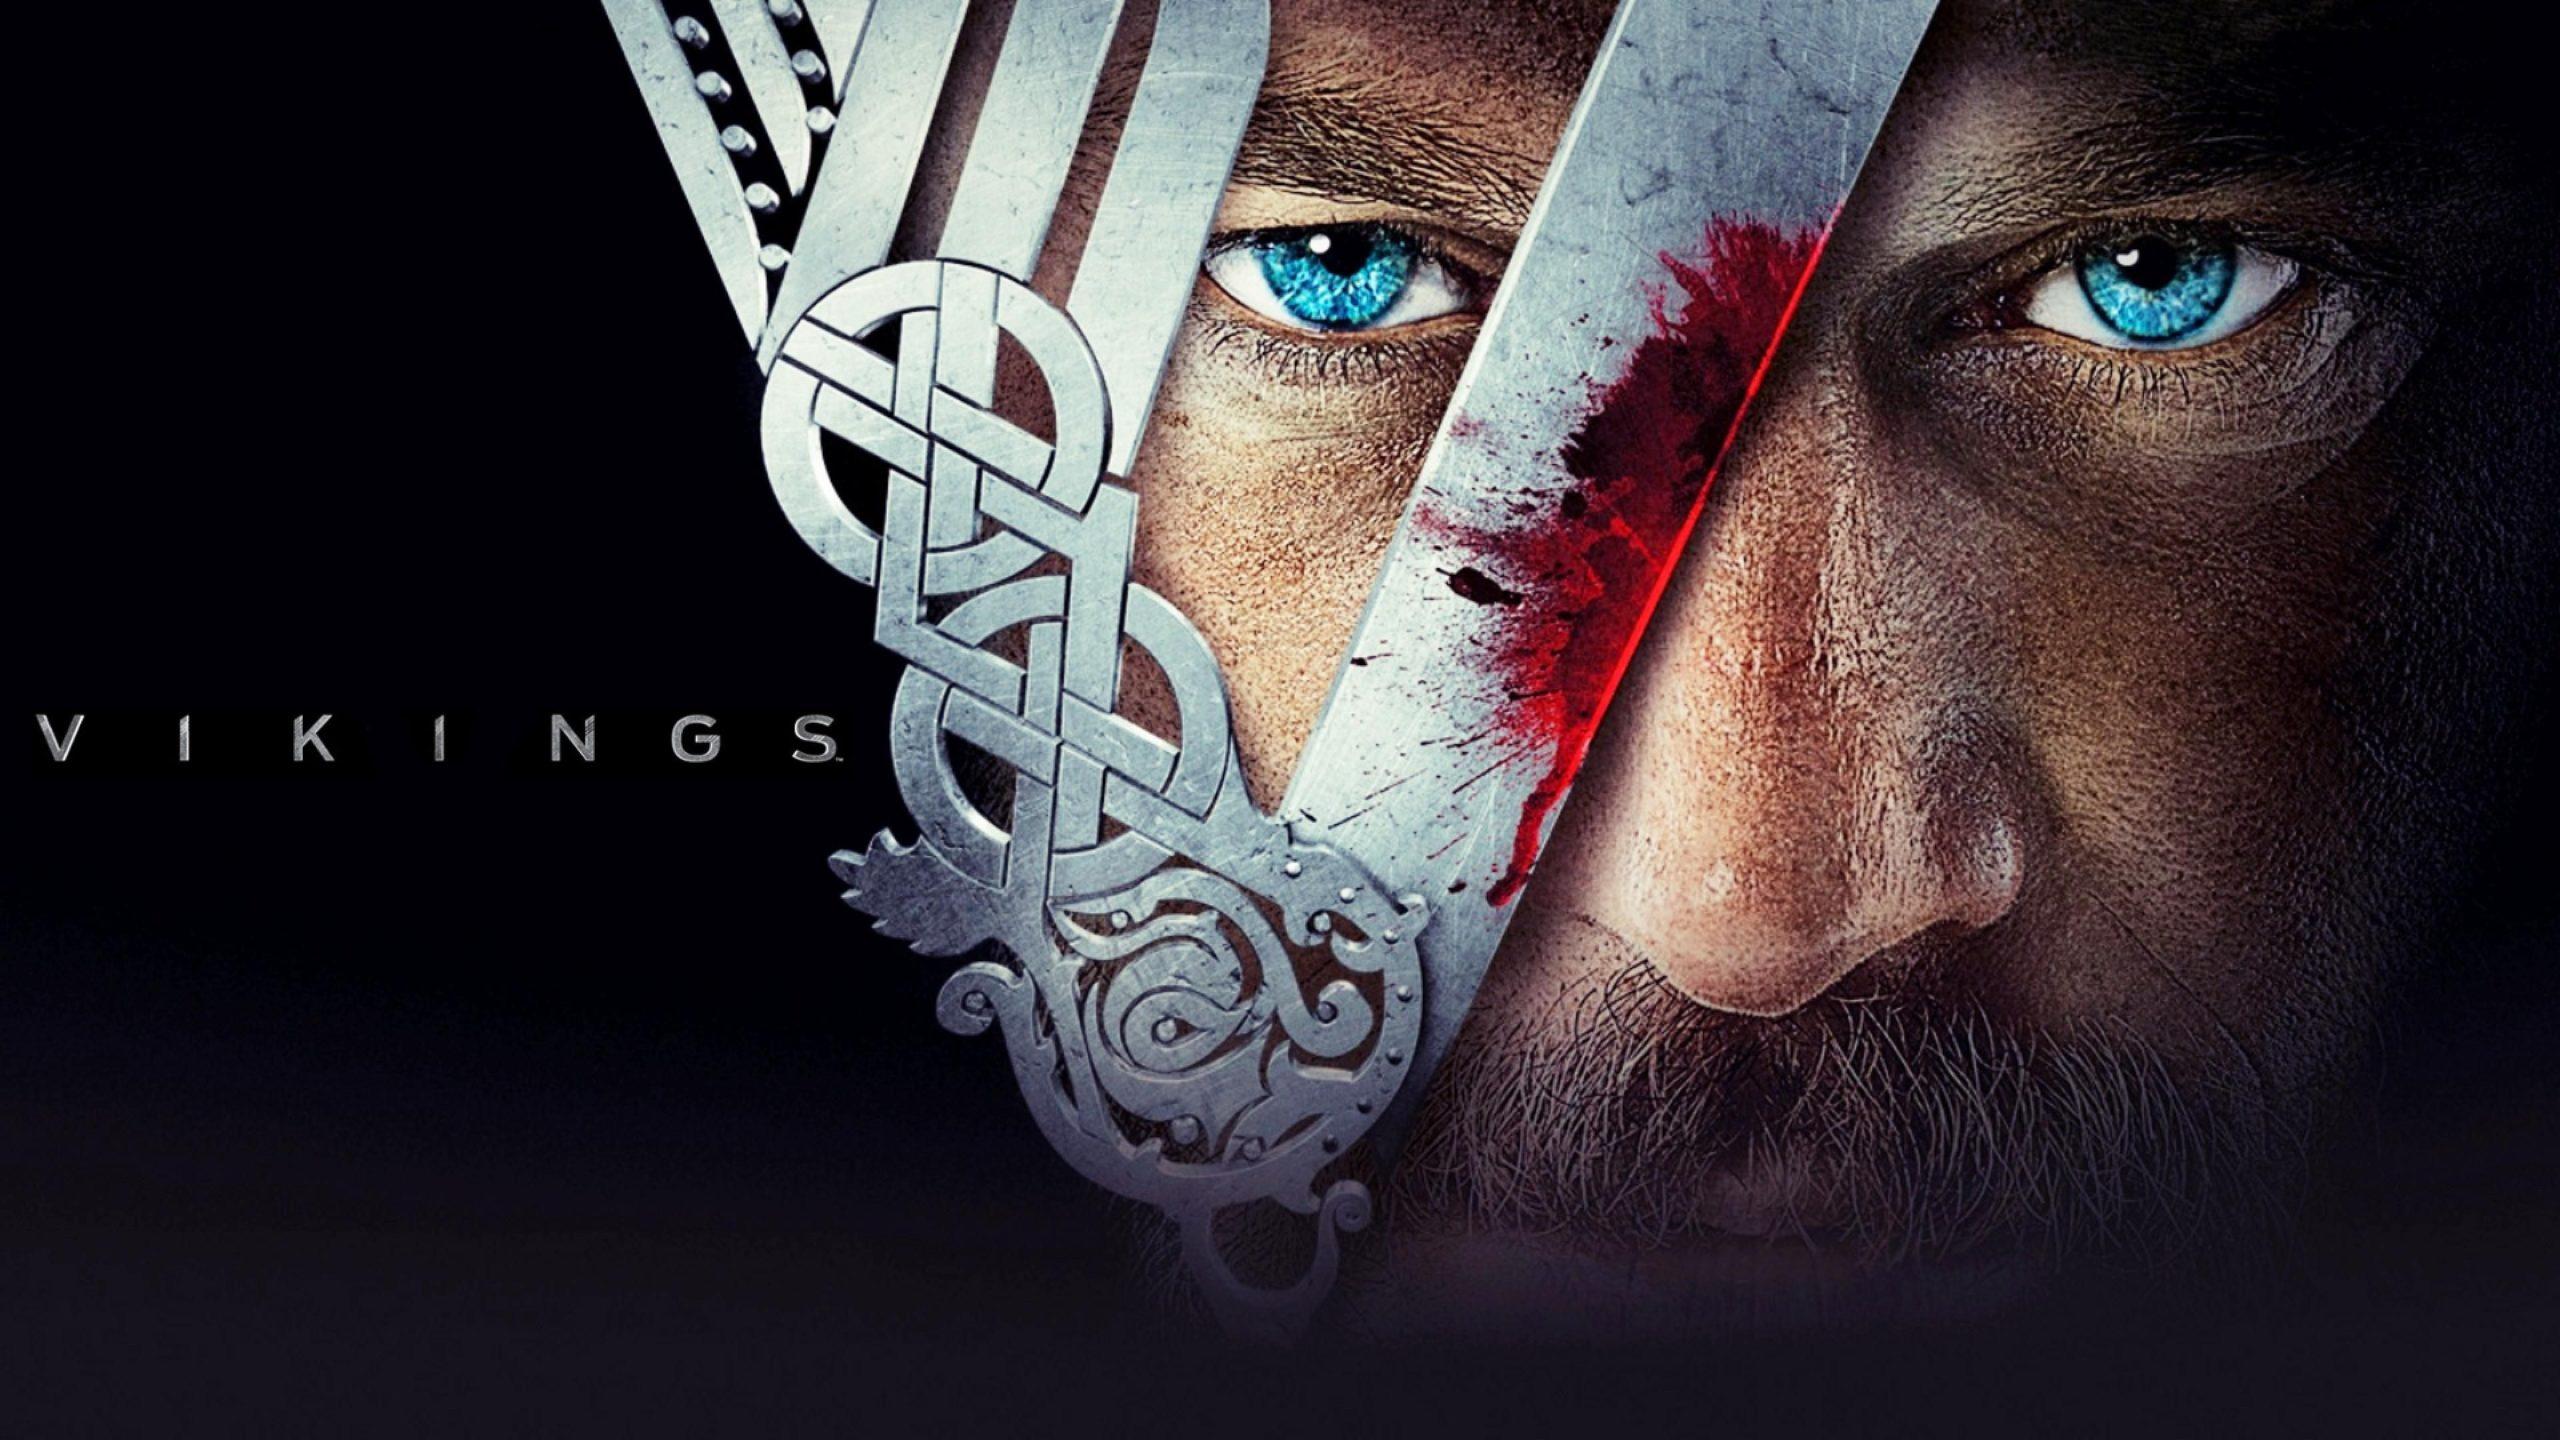 Wallpaper Vikingos